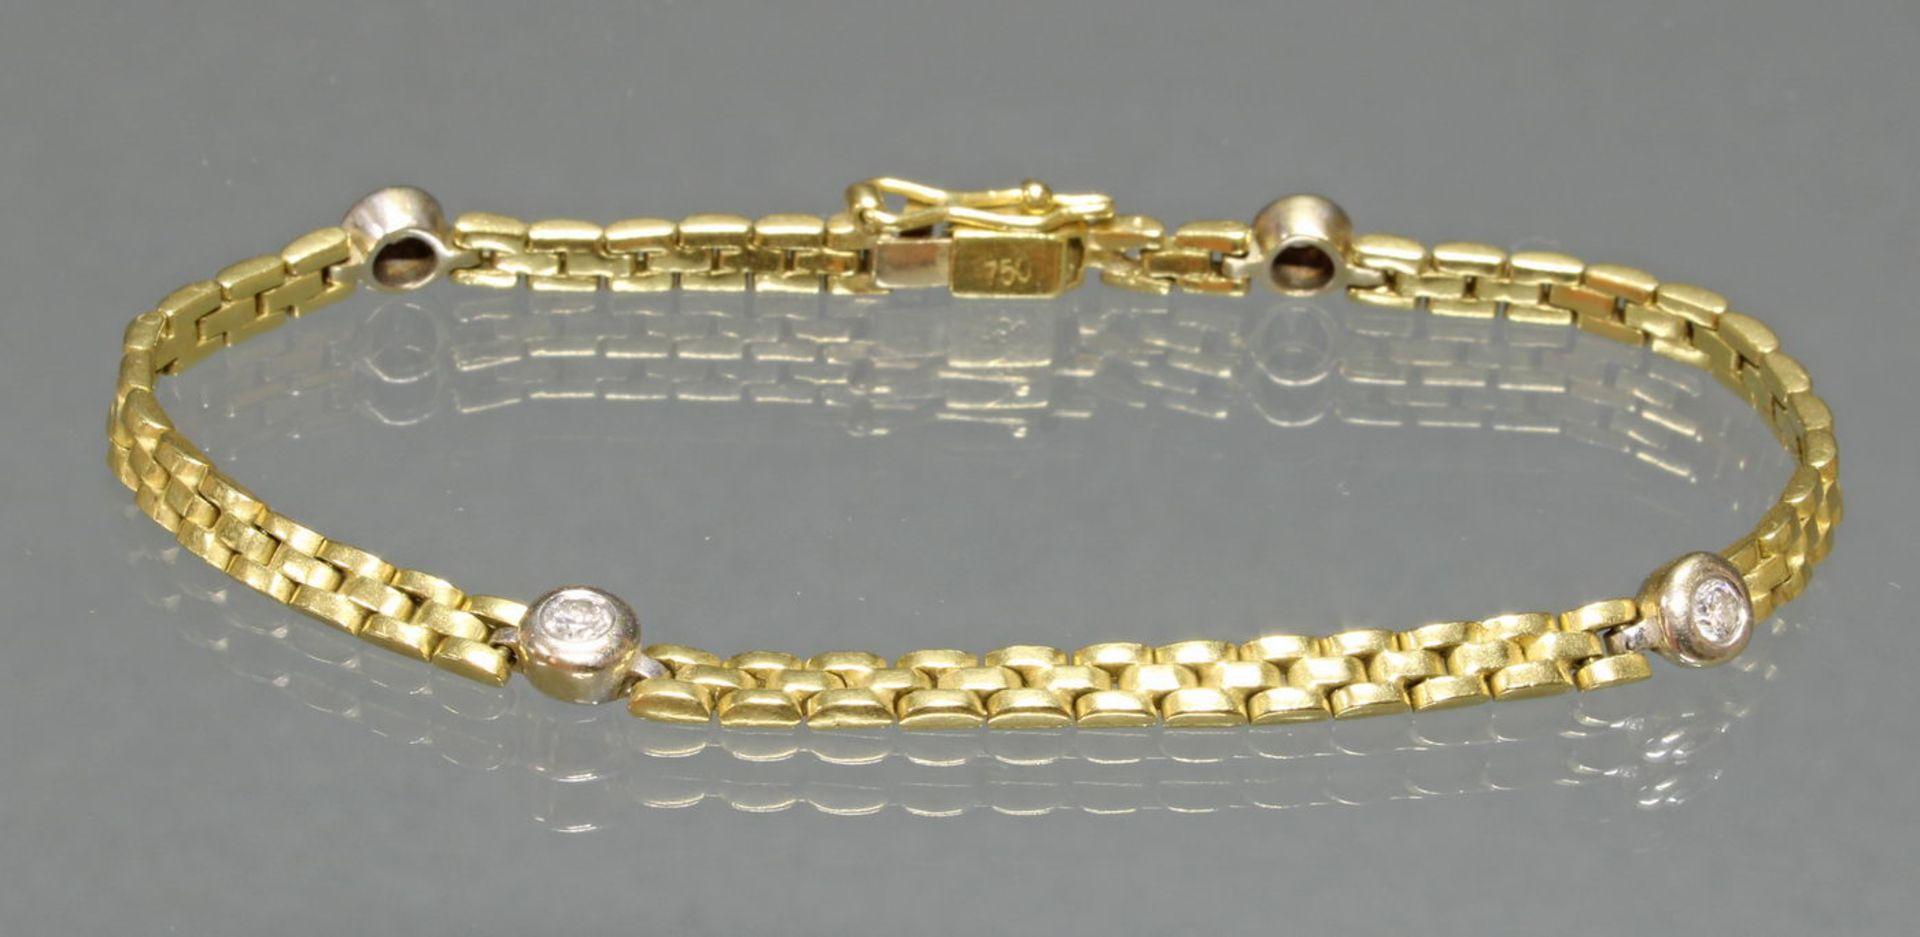 Armband, WG/GG 750, 4 Brillanten zus. ca. 0.40 ct., 19 cm lang, 13 g